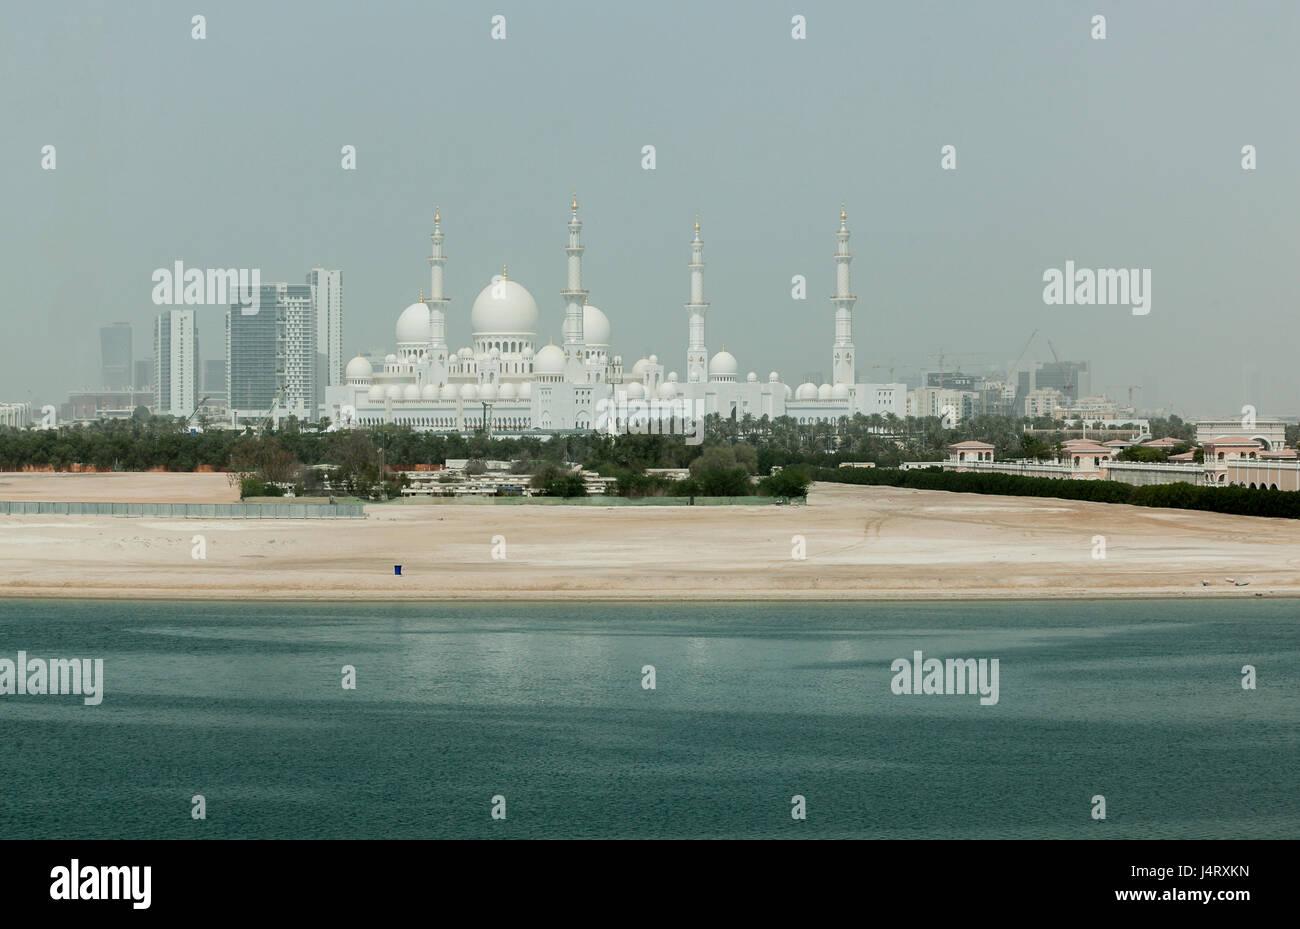 Sheikh Zayed Grand Mosque and mauseleum, Abu dhabi, UAE, Stock Photo